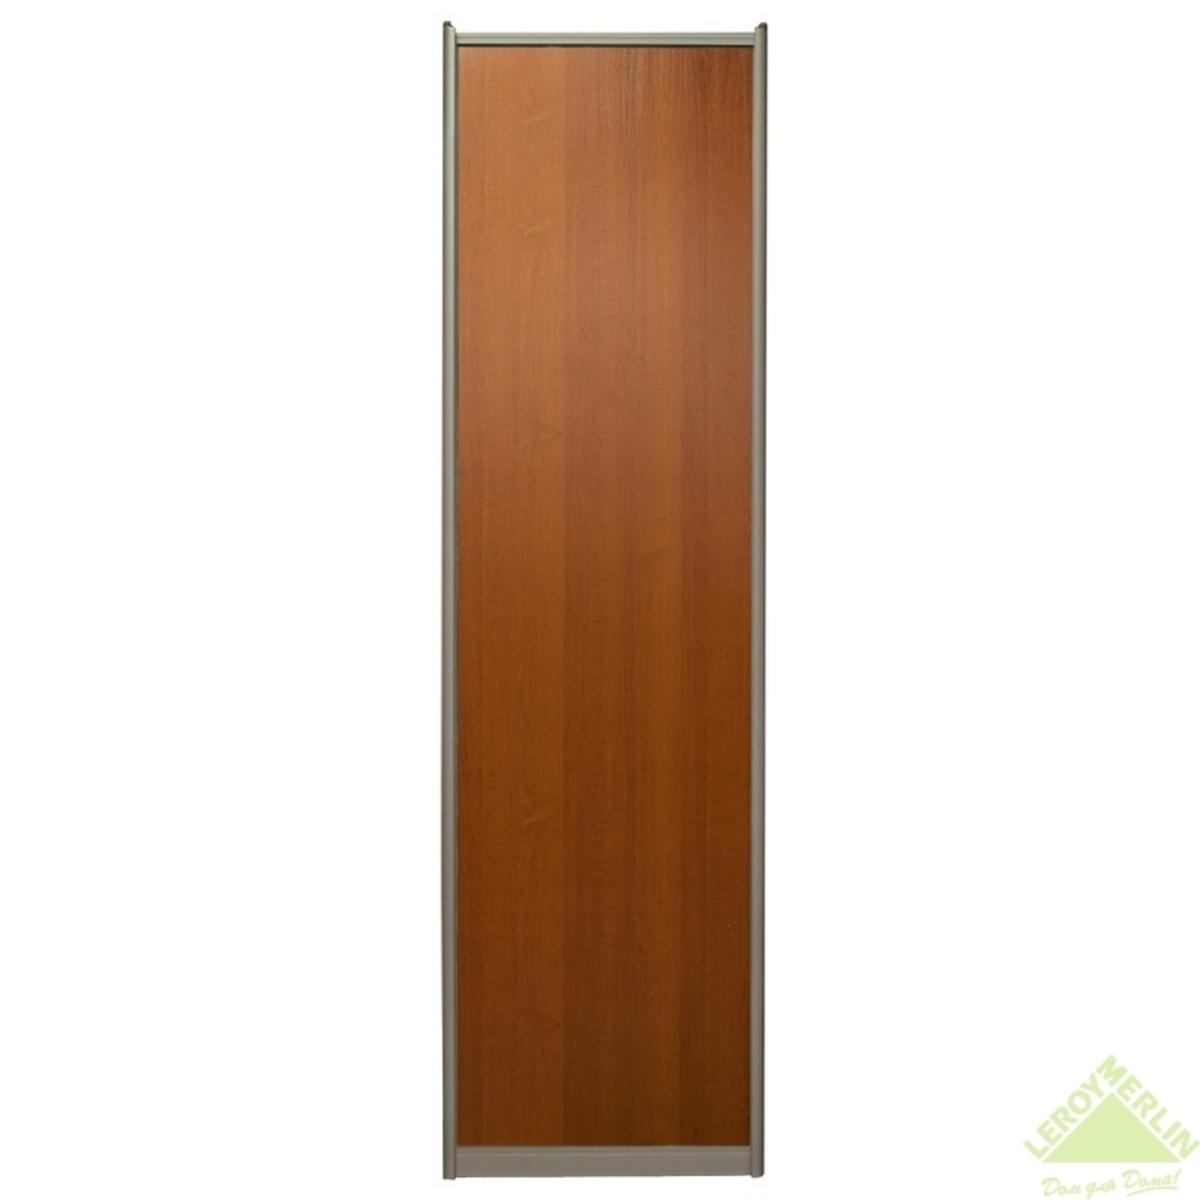 Дверь-купе 2595х704 мм цвет вишня/шампань